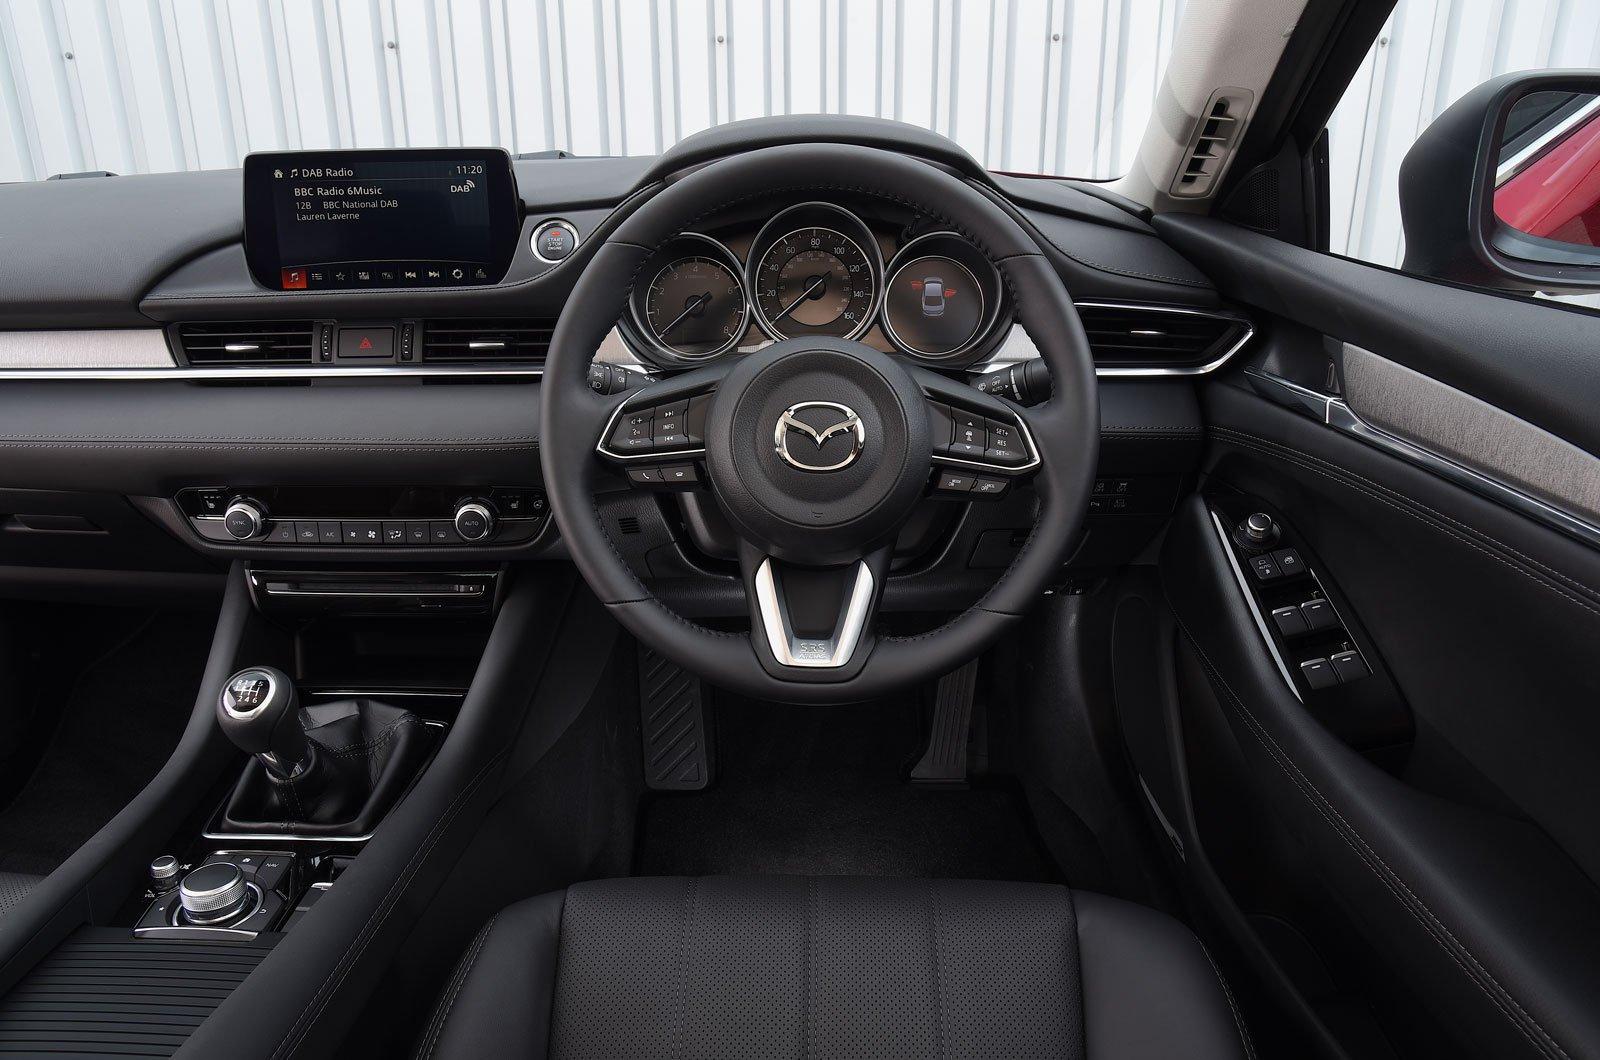 Mazda 6 2.2d SE-L Nav+ auto - interior